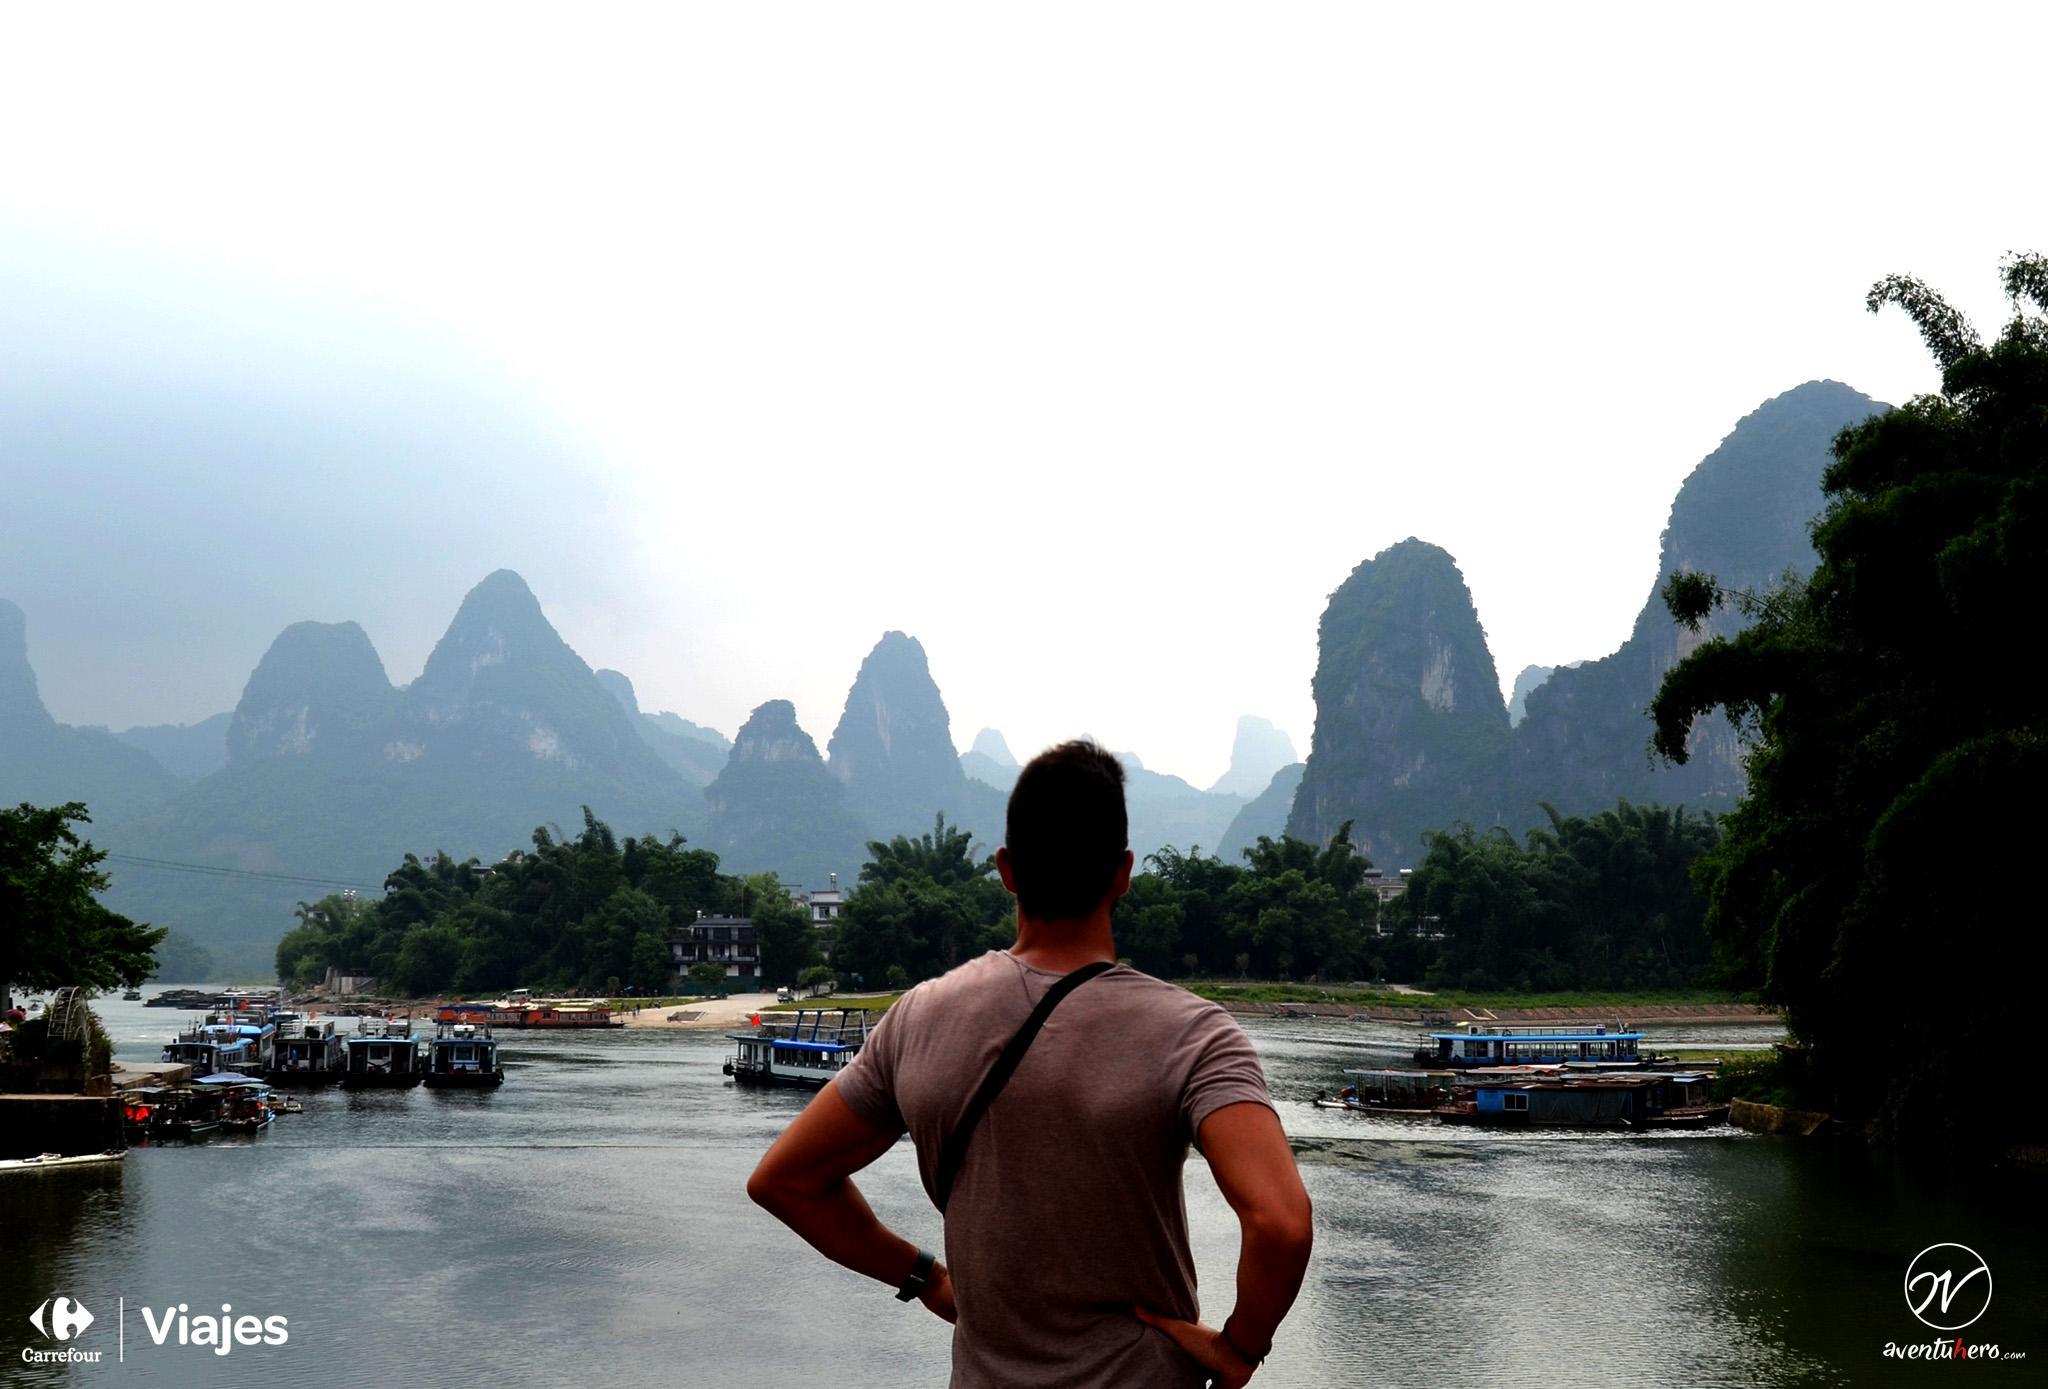 13 Aventuhero - El paisaje chino robado de Vietnam